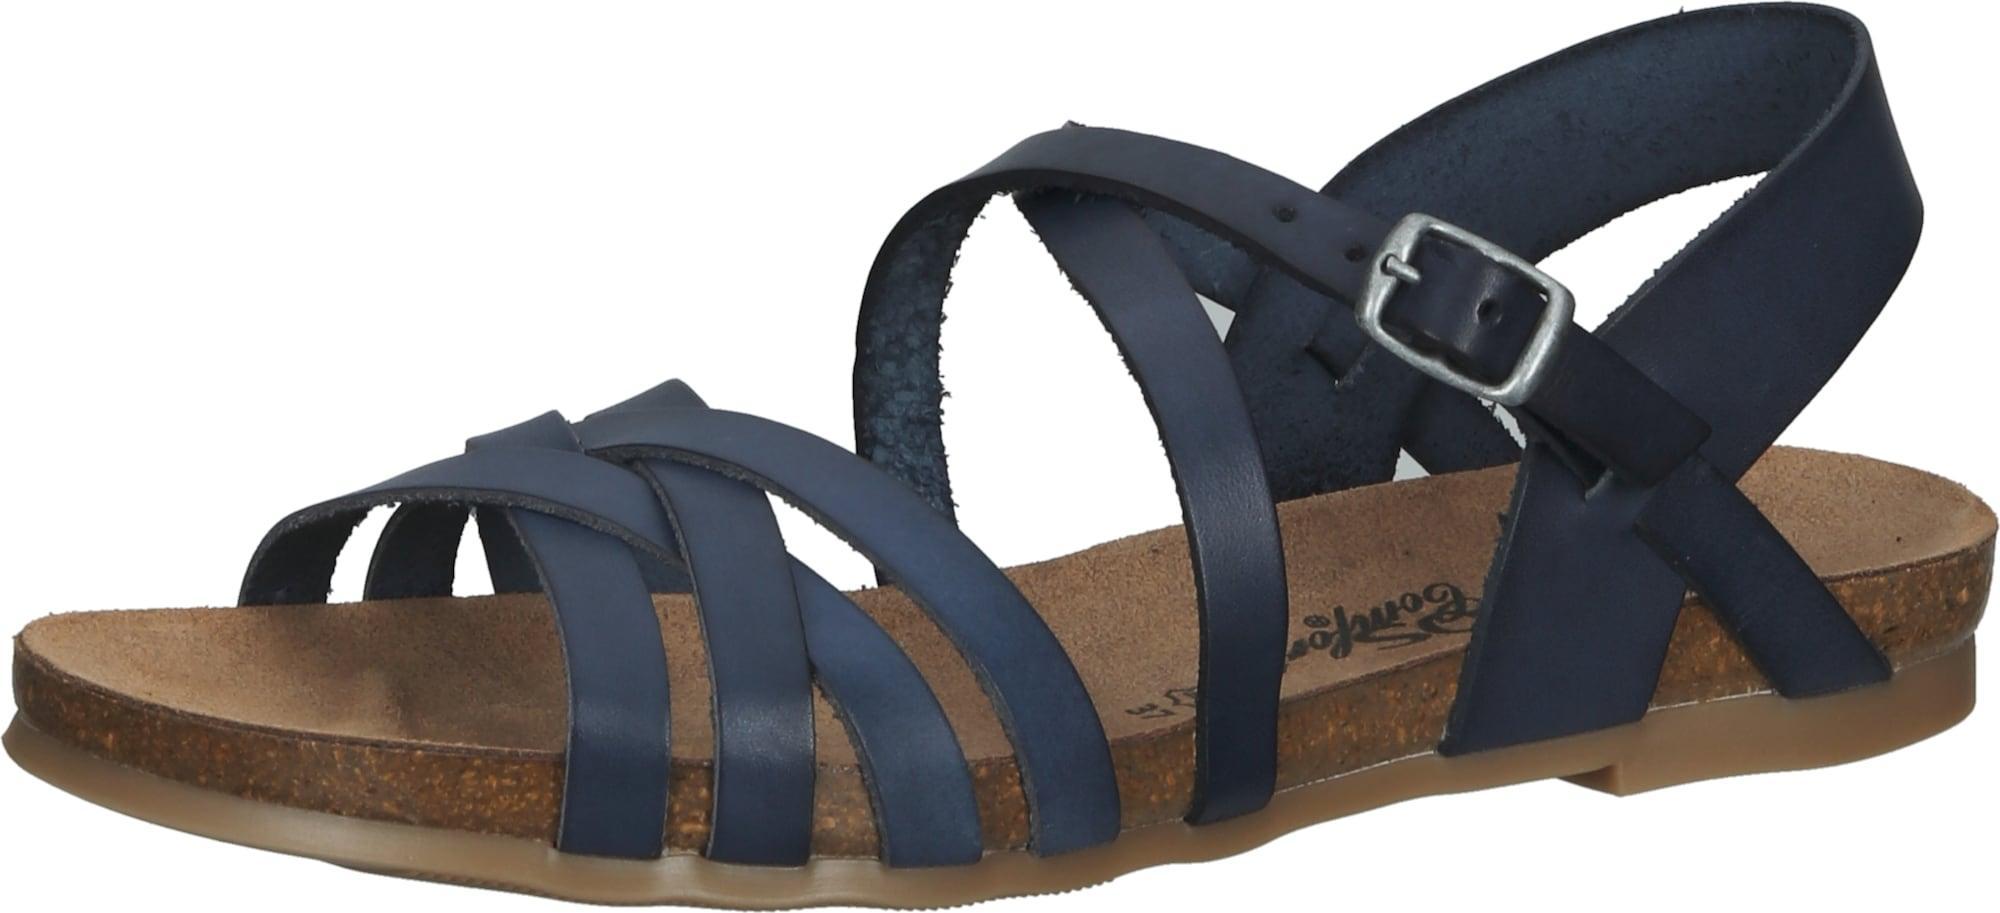 COSMOS COMFORT Sandalen blau